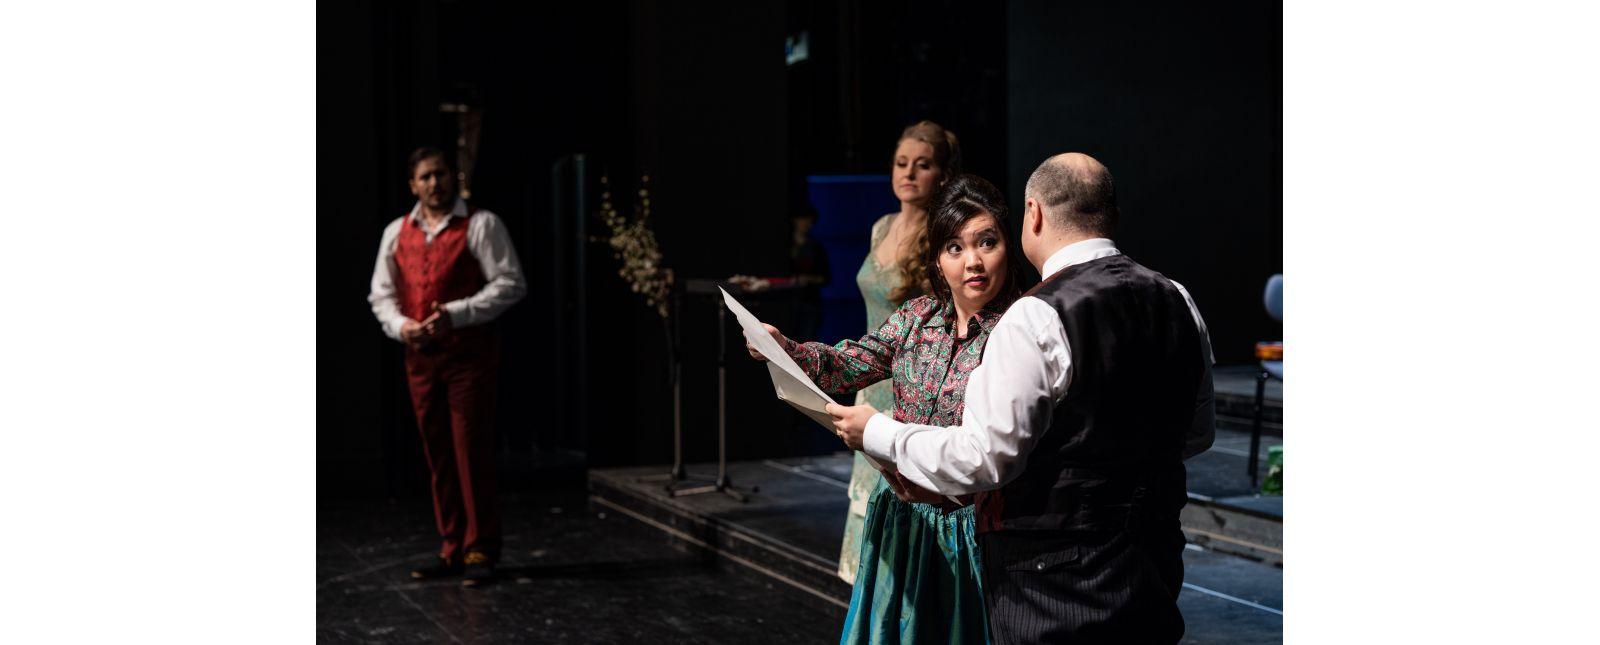 Kosmos Korngold // Jeff Gwaltney / Arminia Friebe / Irina Jae-Eun Park / Roberto Gionfriddo // 2020 // Britt Schilling